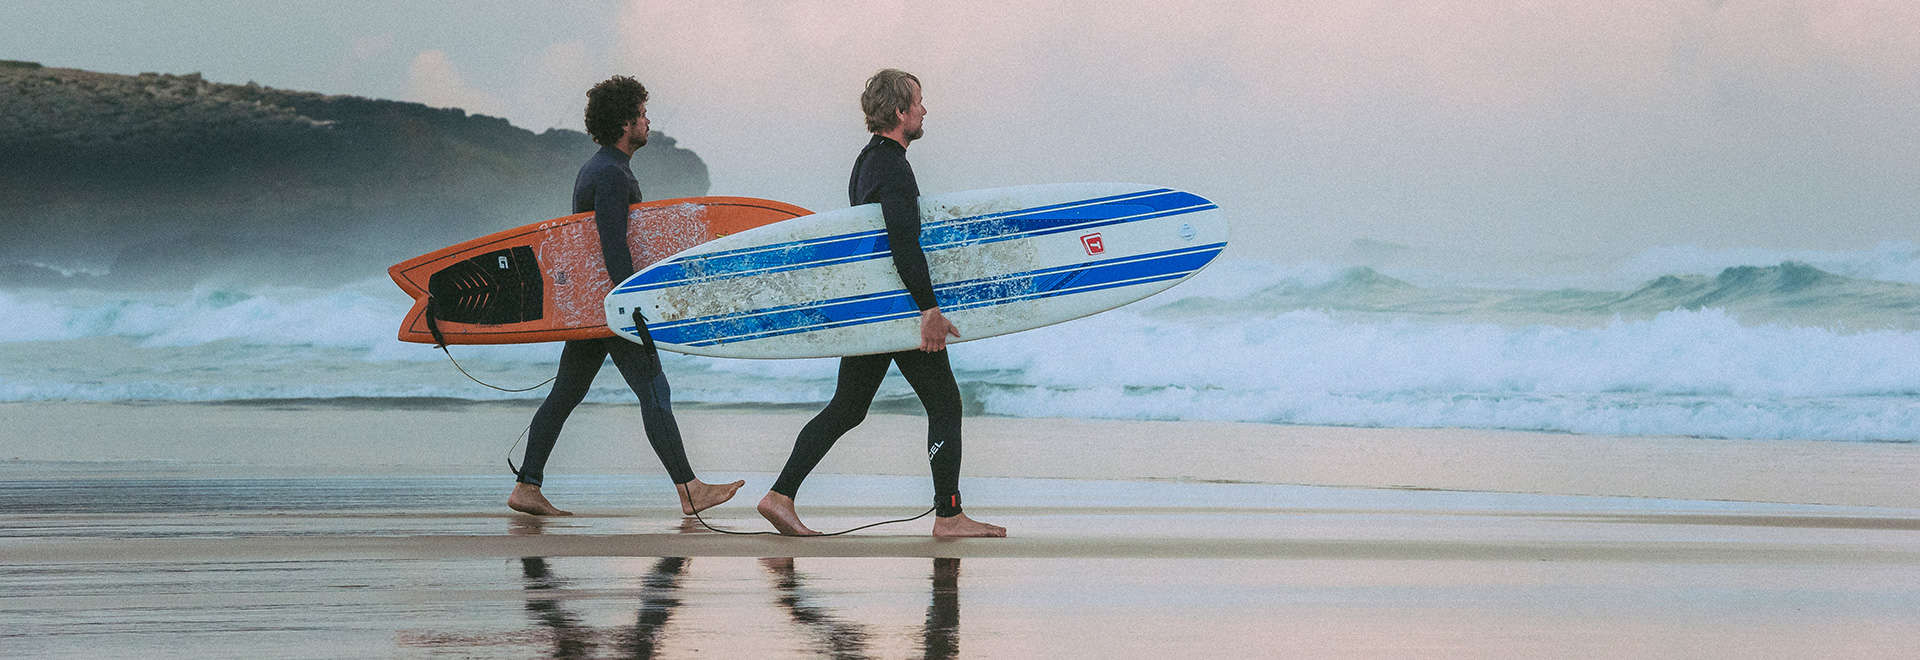 surfer at beach surf guiding lisbon area